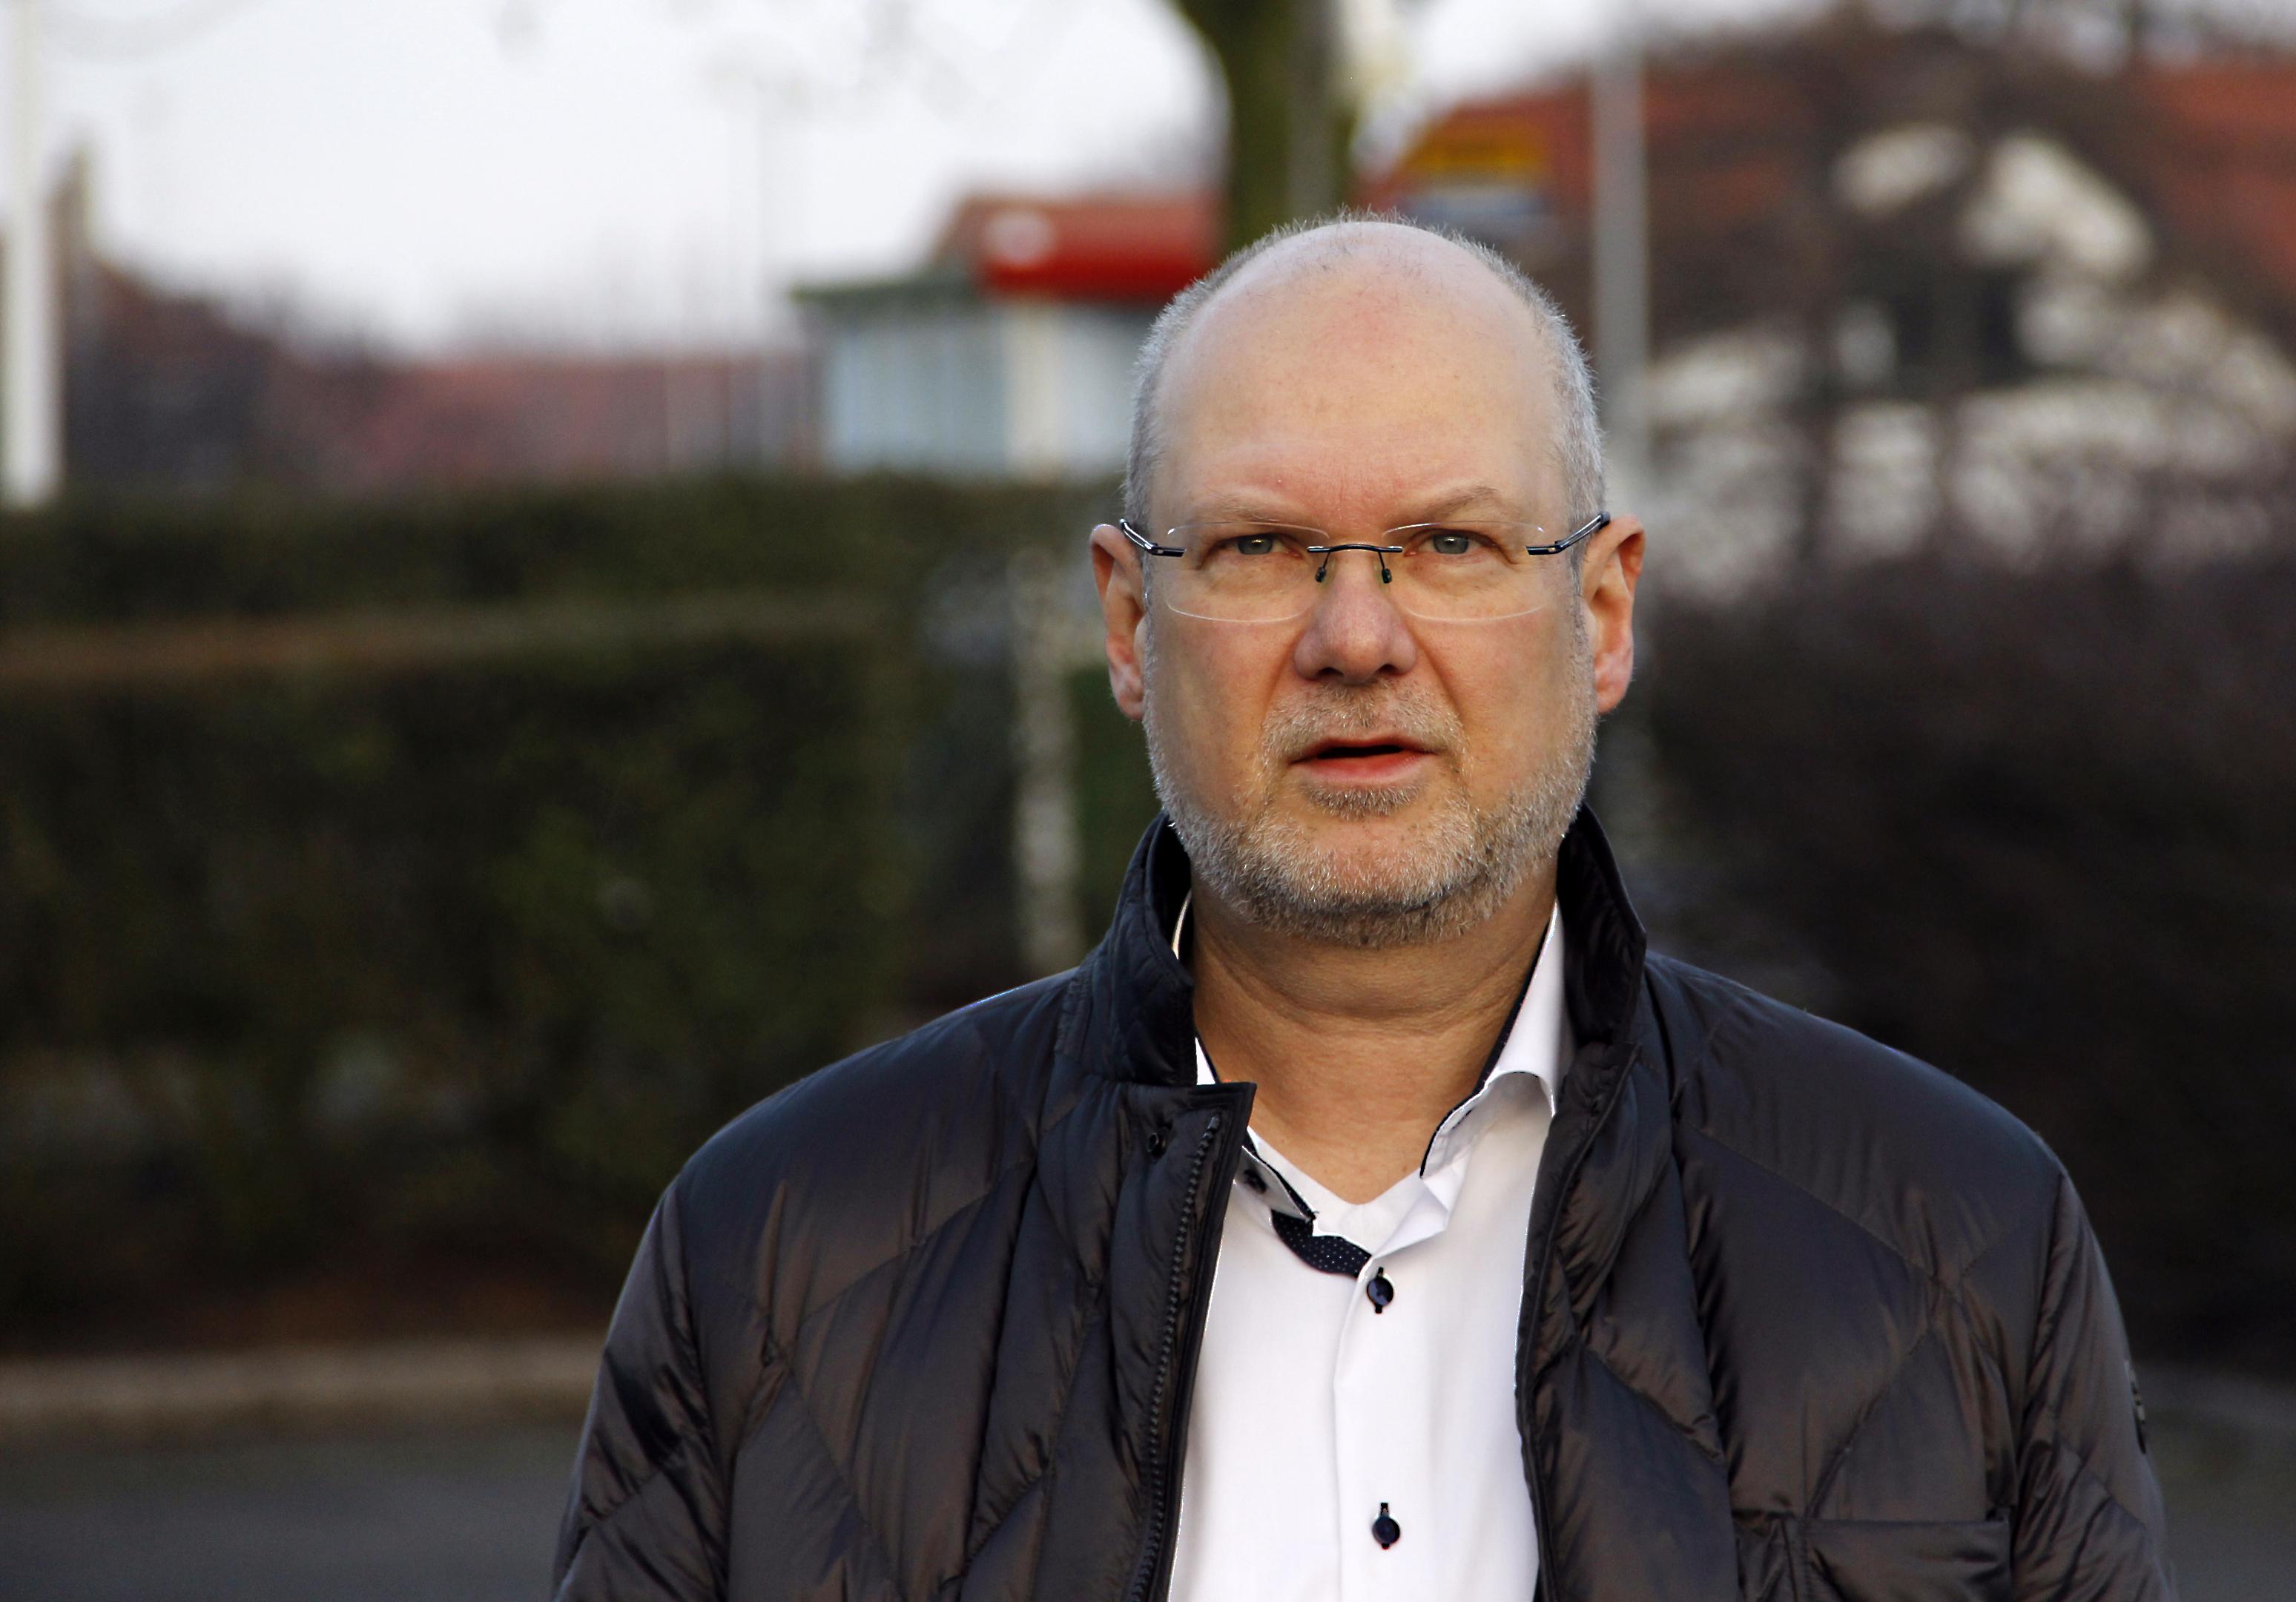 Forskningschef Michael Ejstrup, DMJX